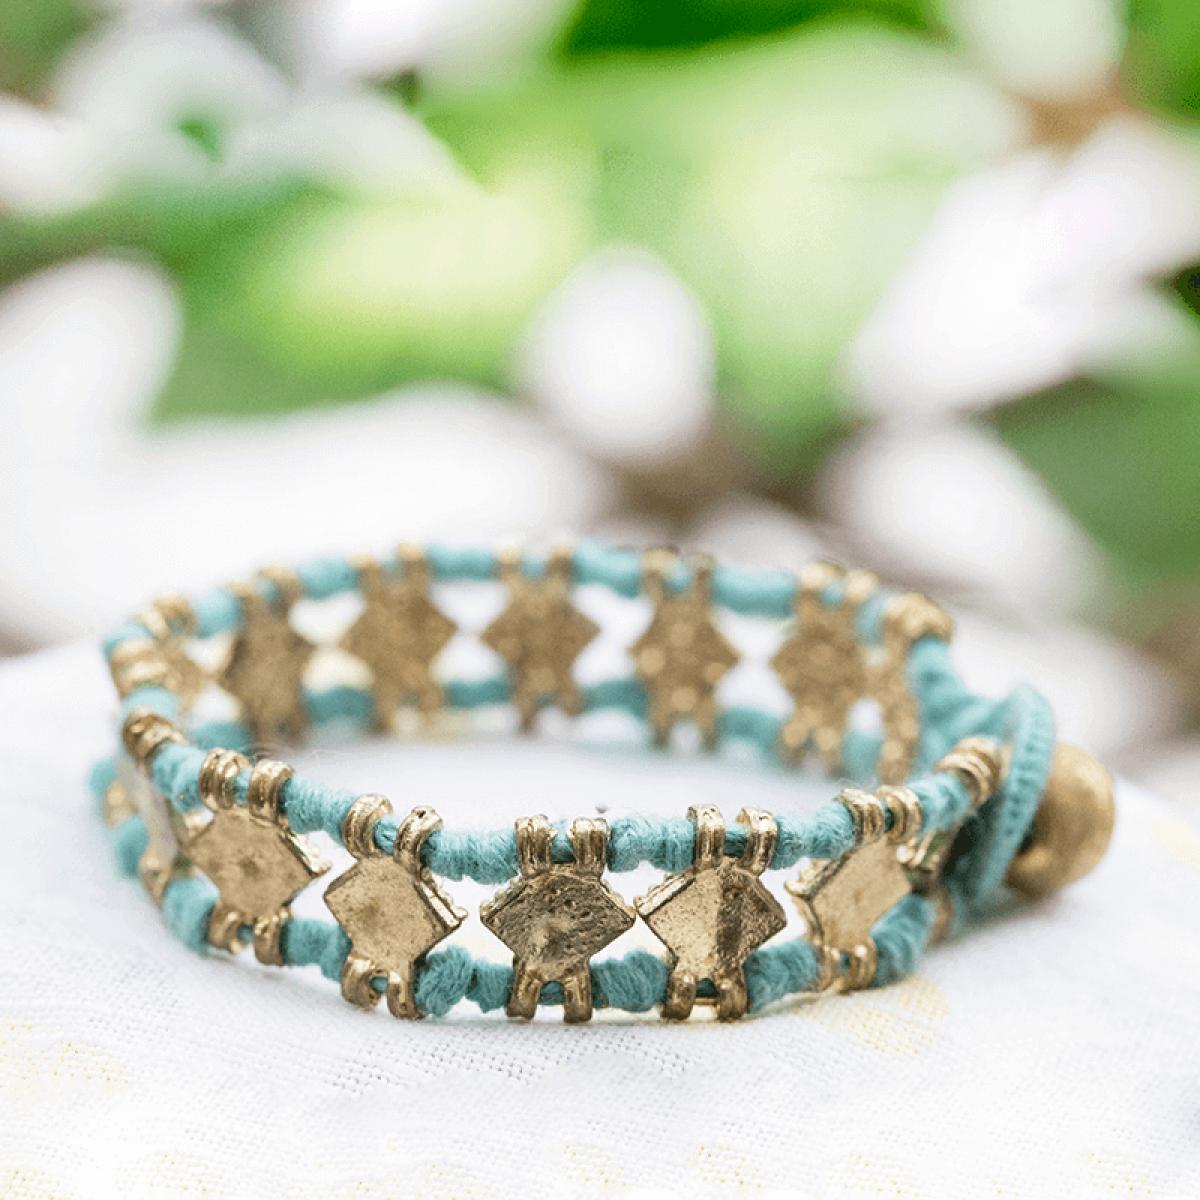 Bohemian Fashion Bracelet - Turquoise